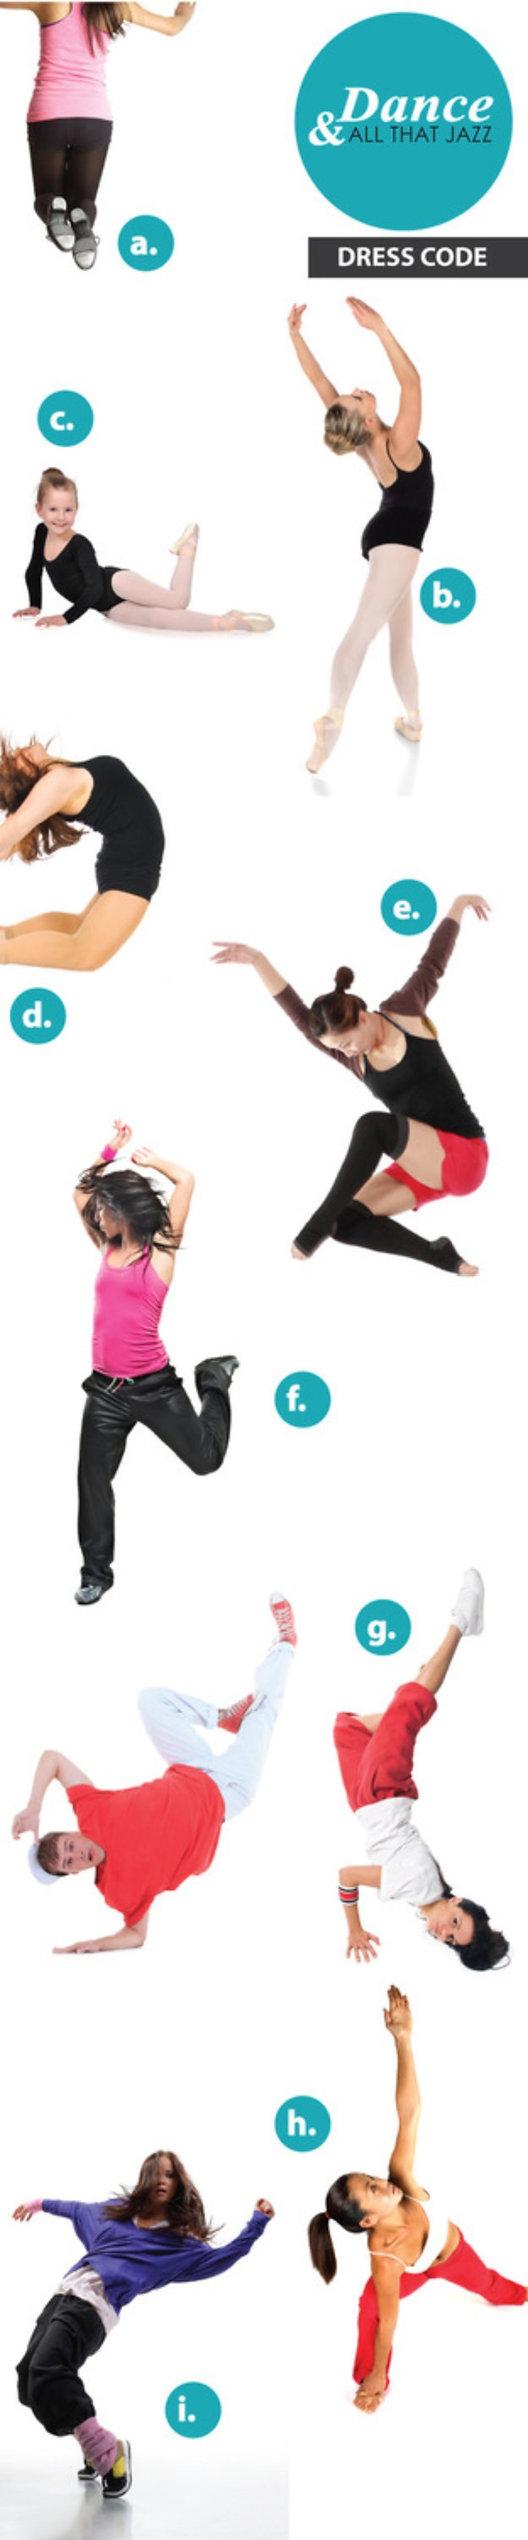 Dance & All That Jazz| Dress Code